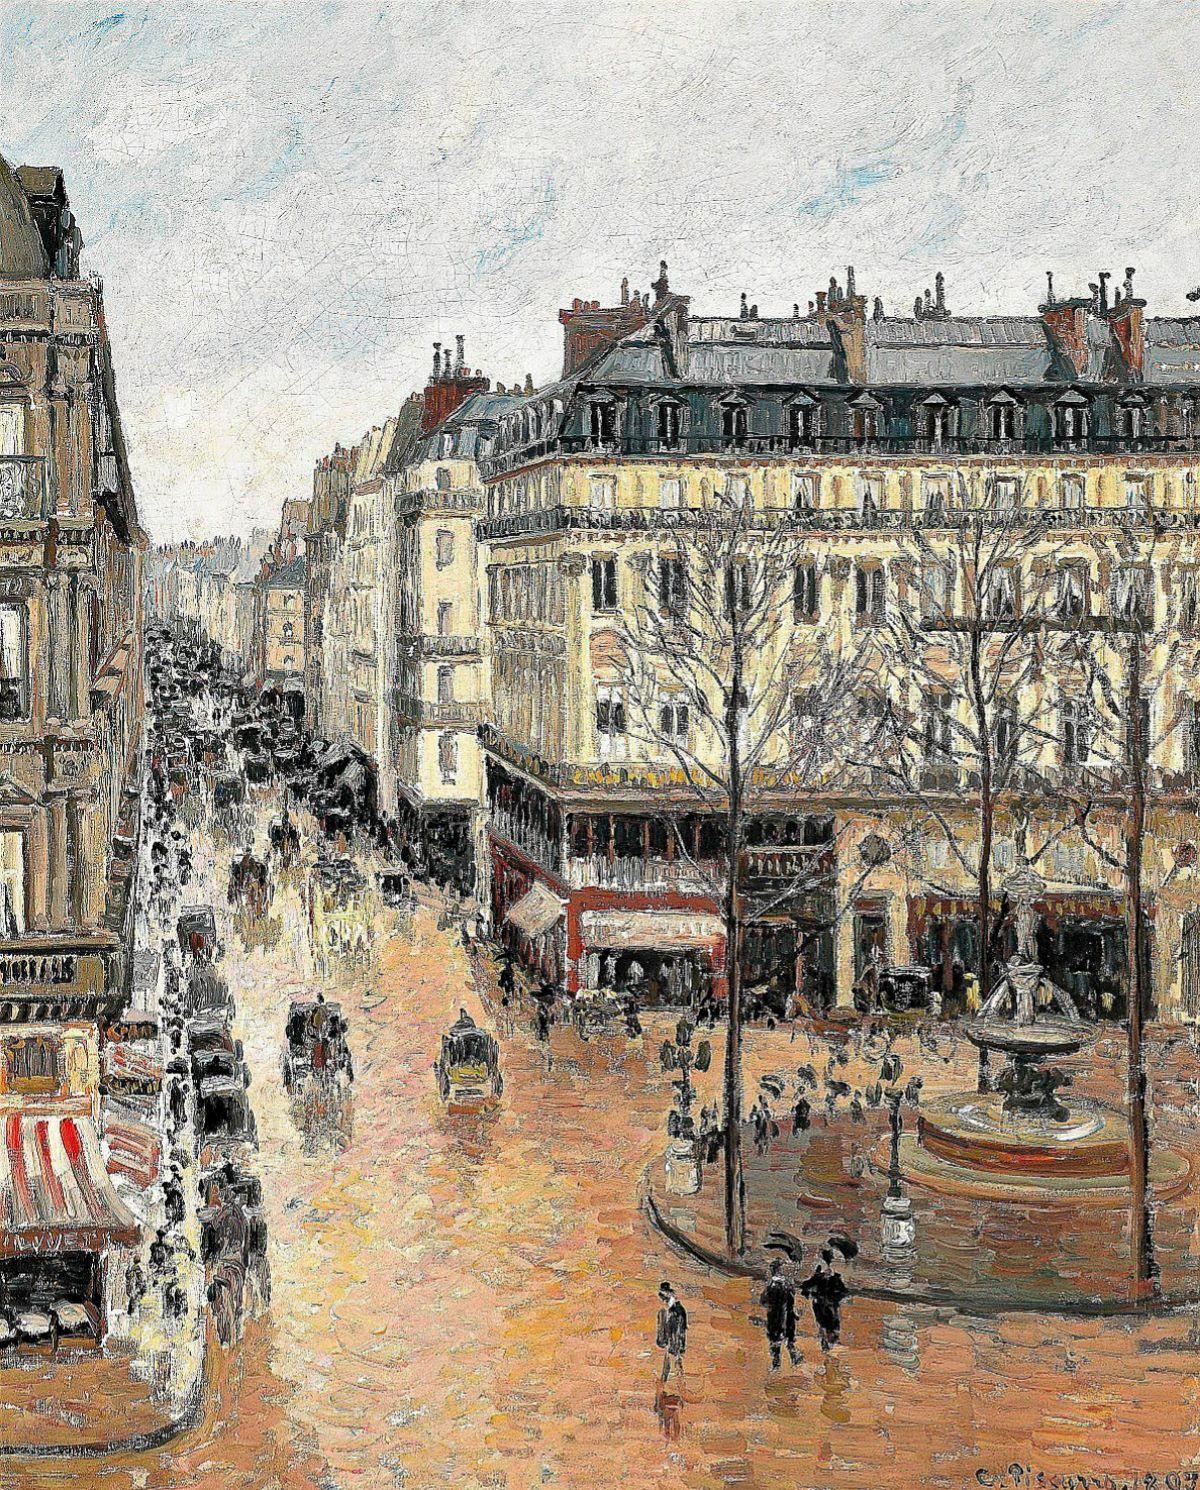 'Rue Saint-Honoré por la tarde. Efecto de lluvia', de Pissarro